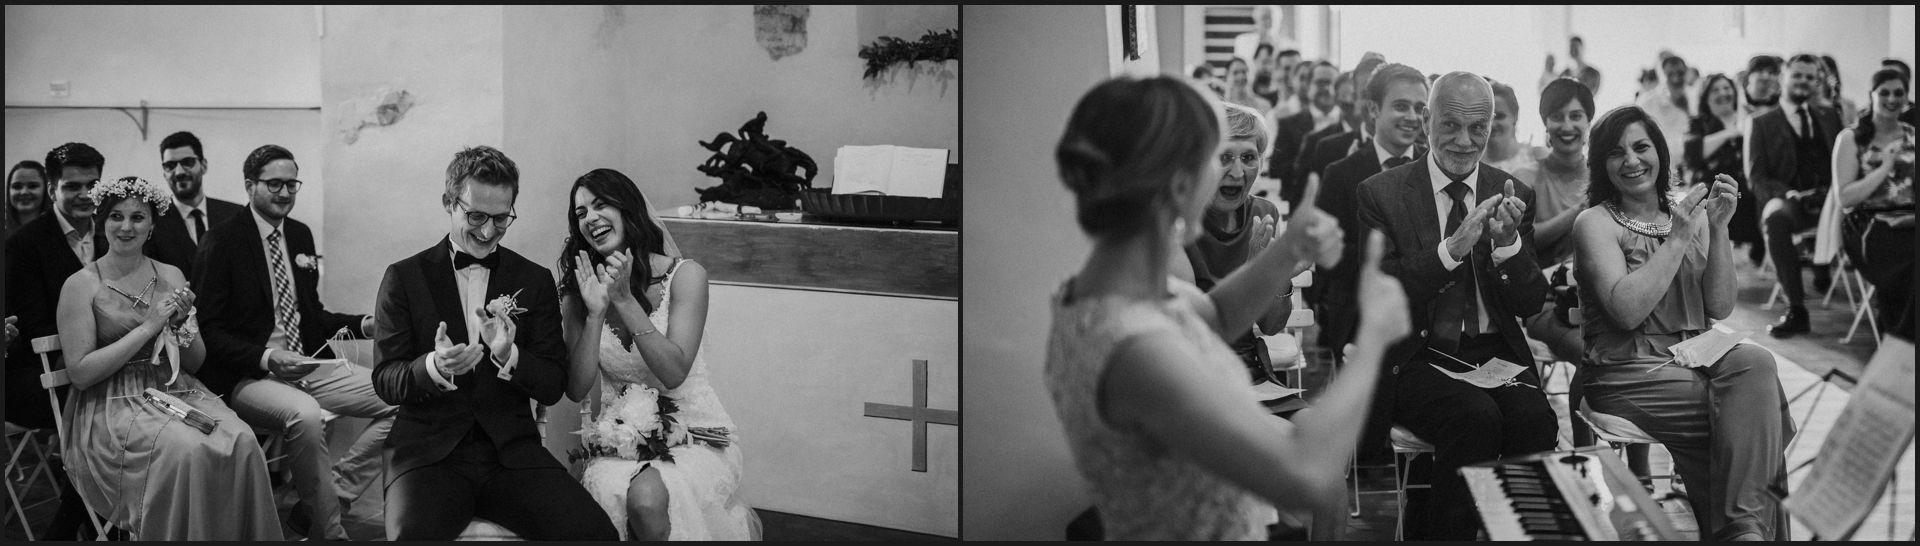 wedding, symbolic ceremony, wedding, umbria, nikis resort, black and white, funny,